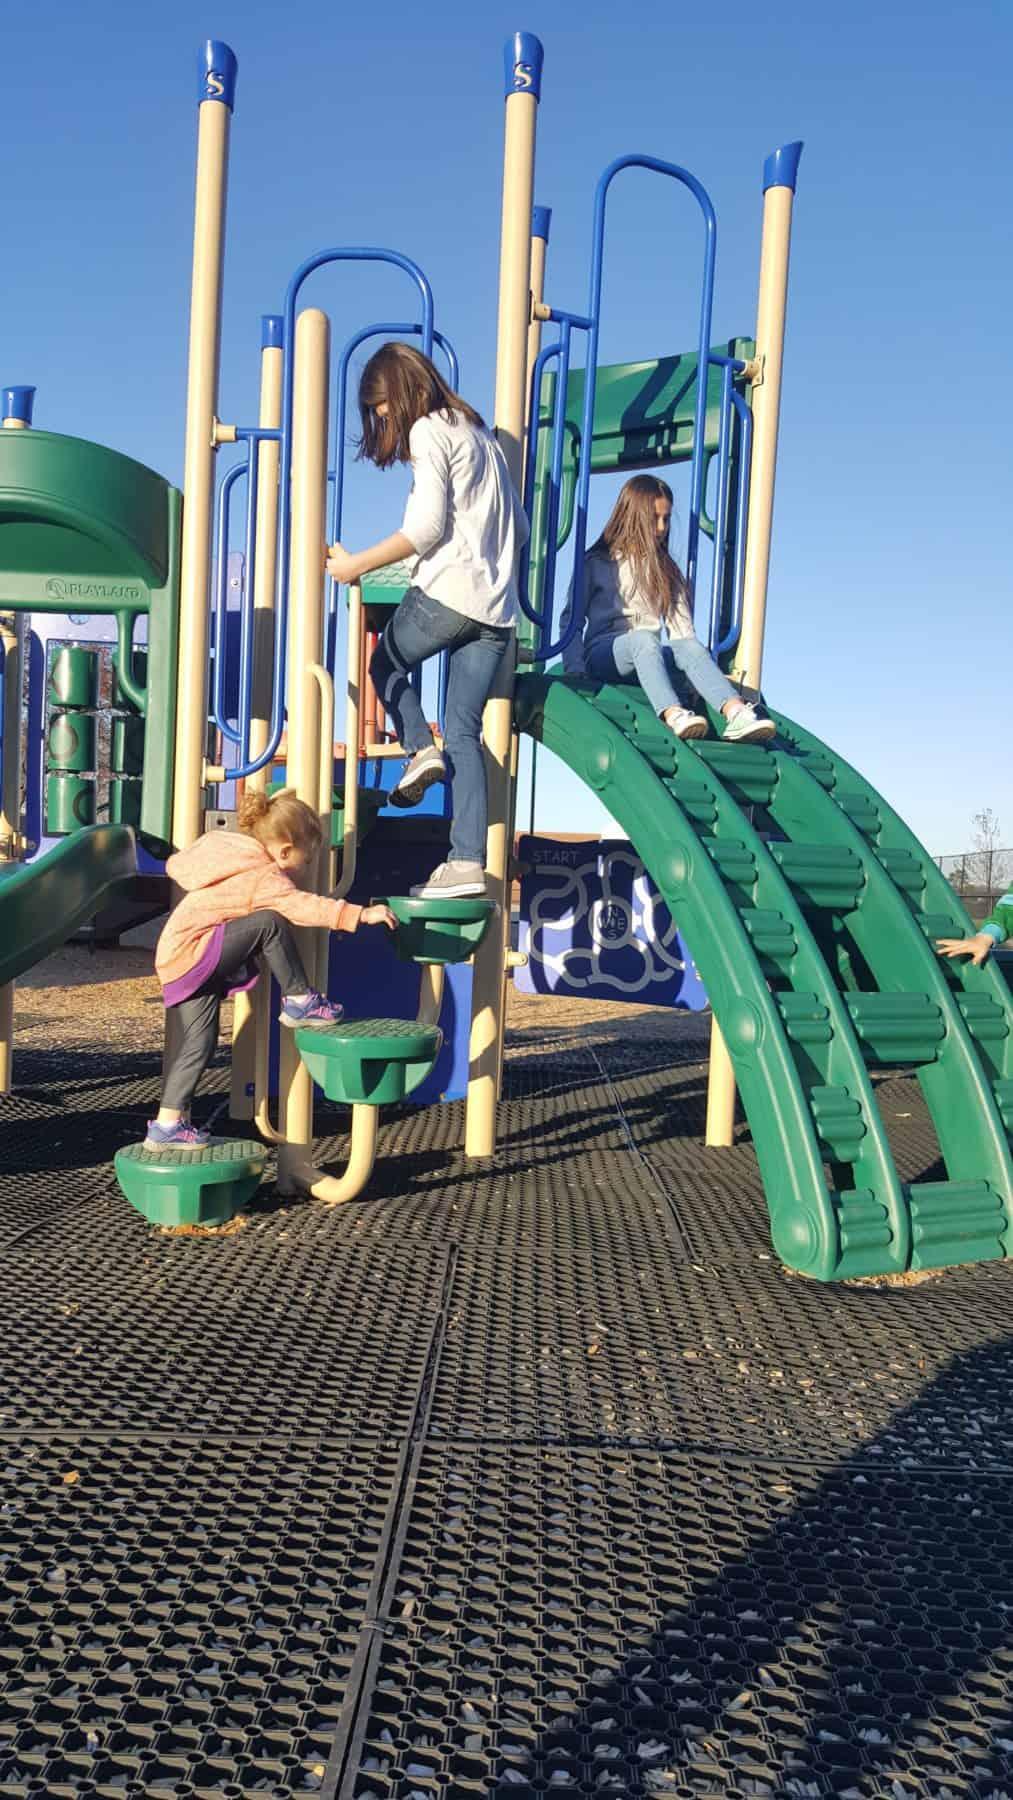 outdoor flooring equipment playground mats play uk esp educational surfacing